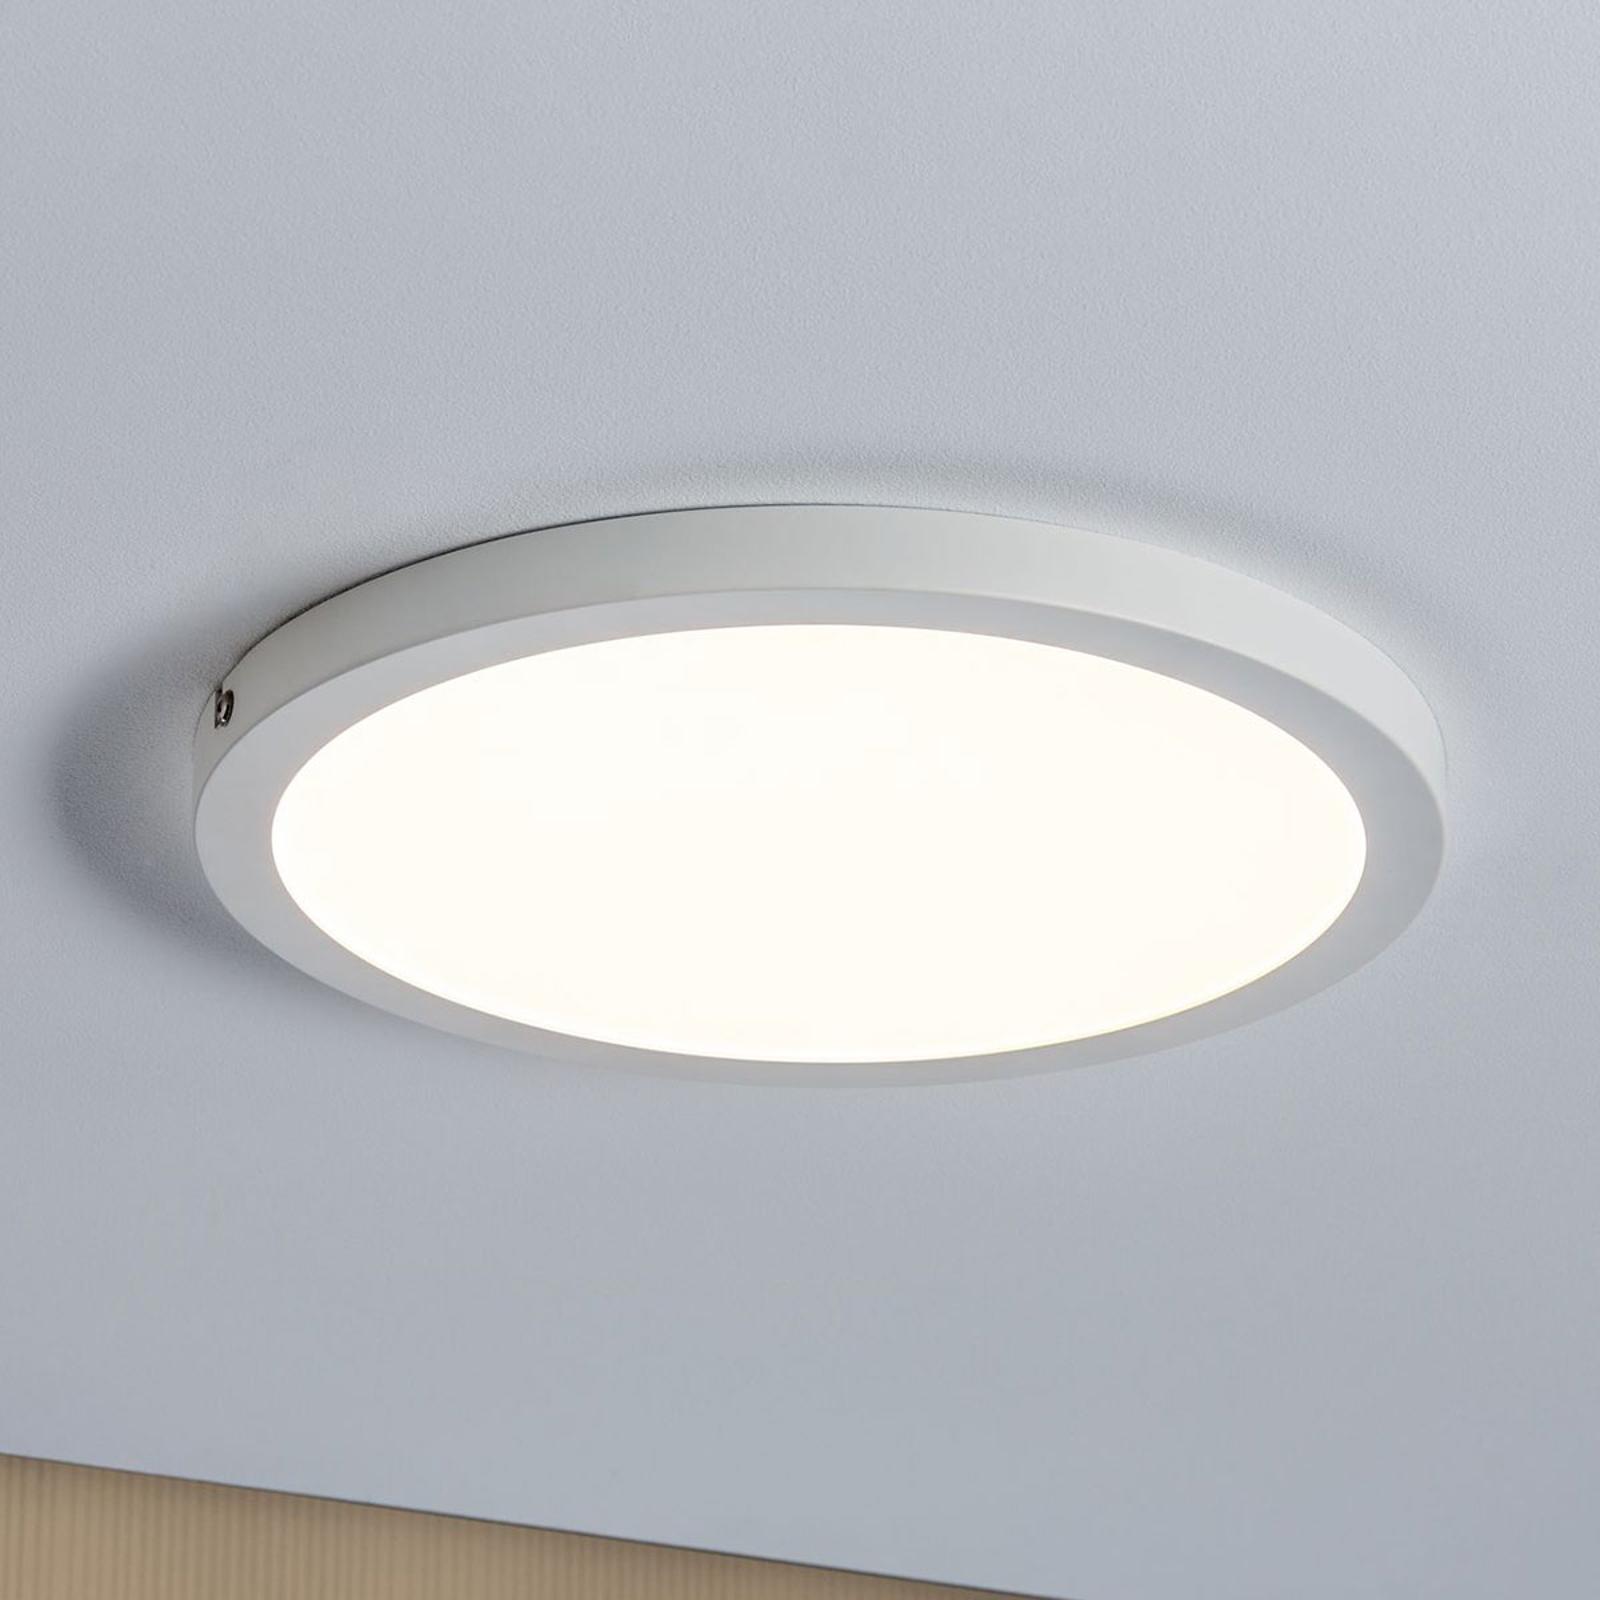 Paulmann Atria LED plafondlamp Ø30cm wit mat